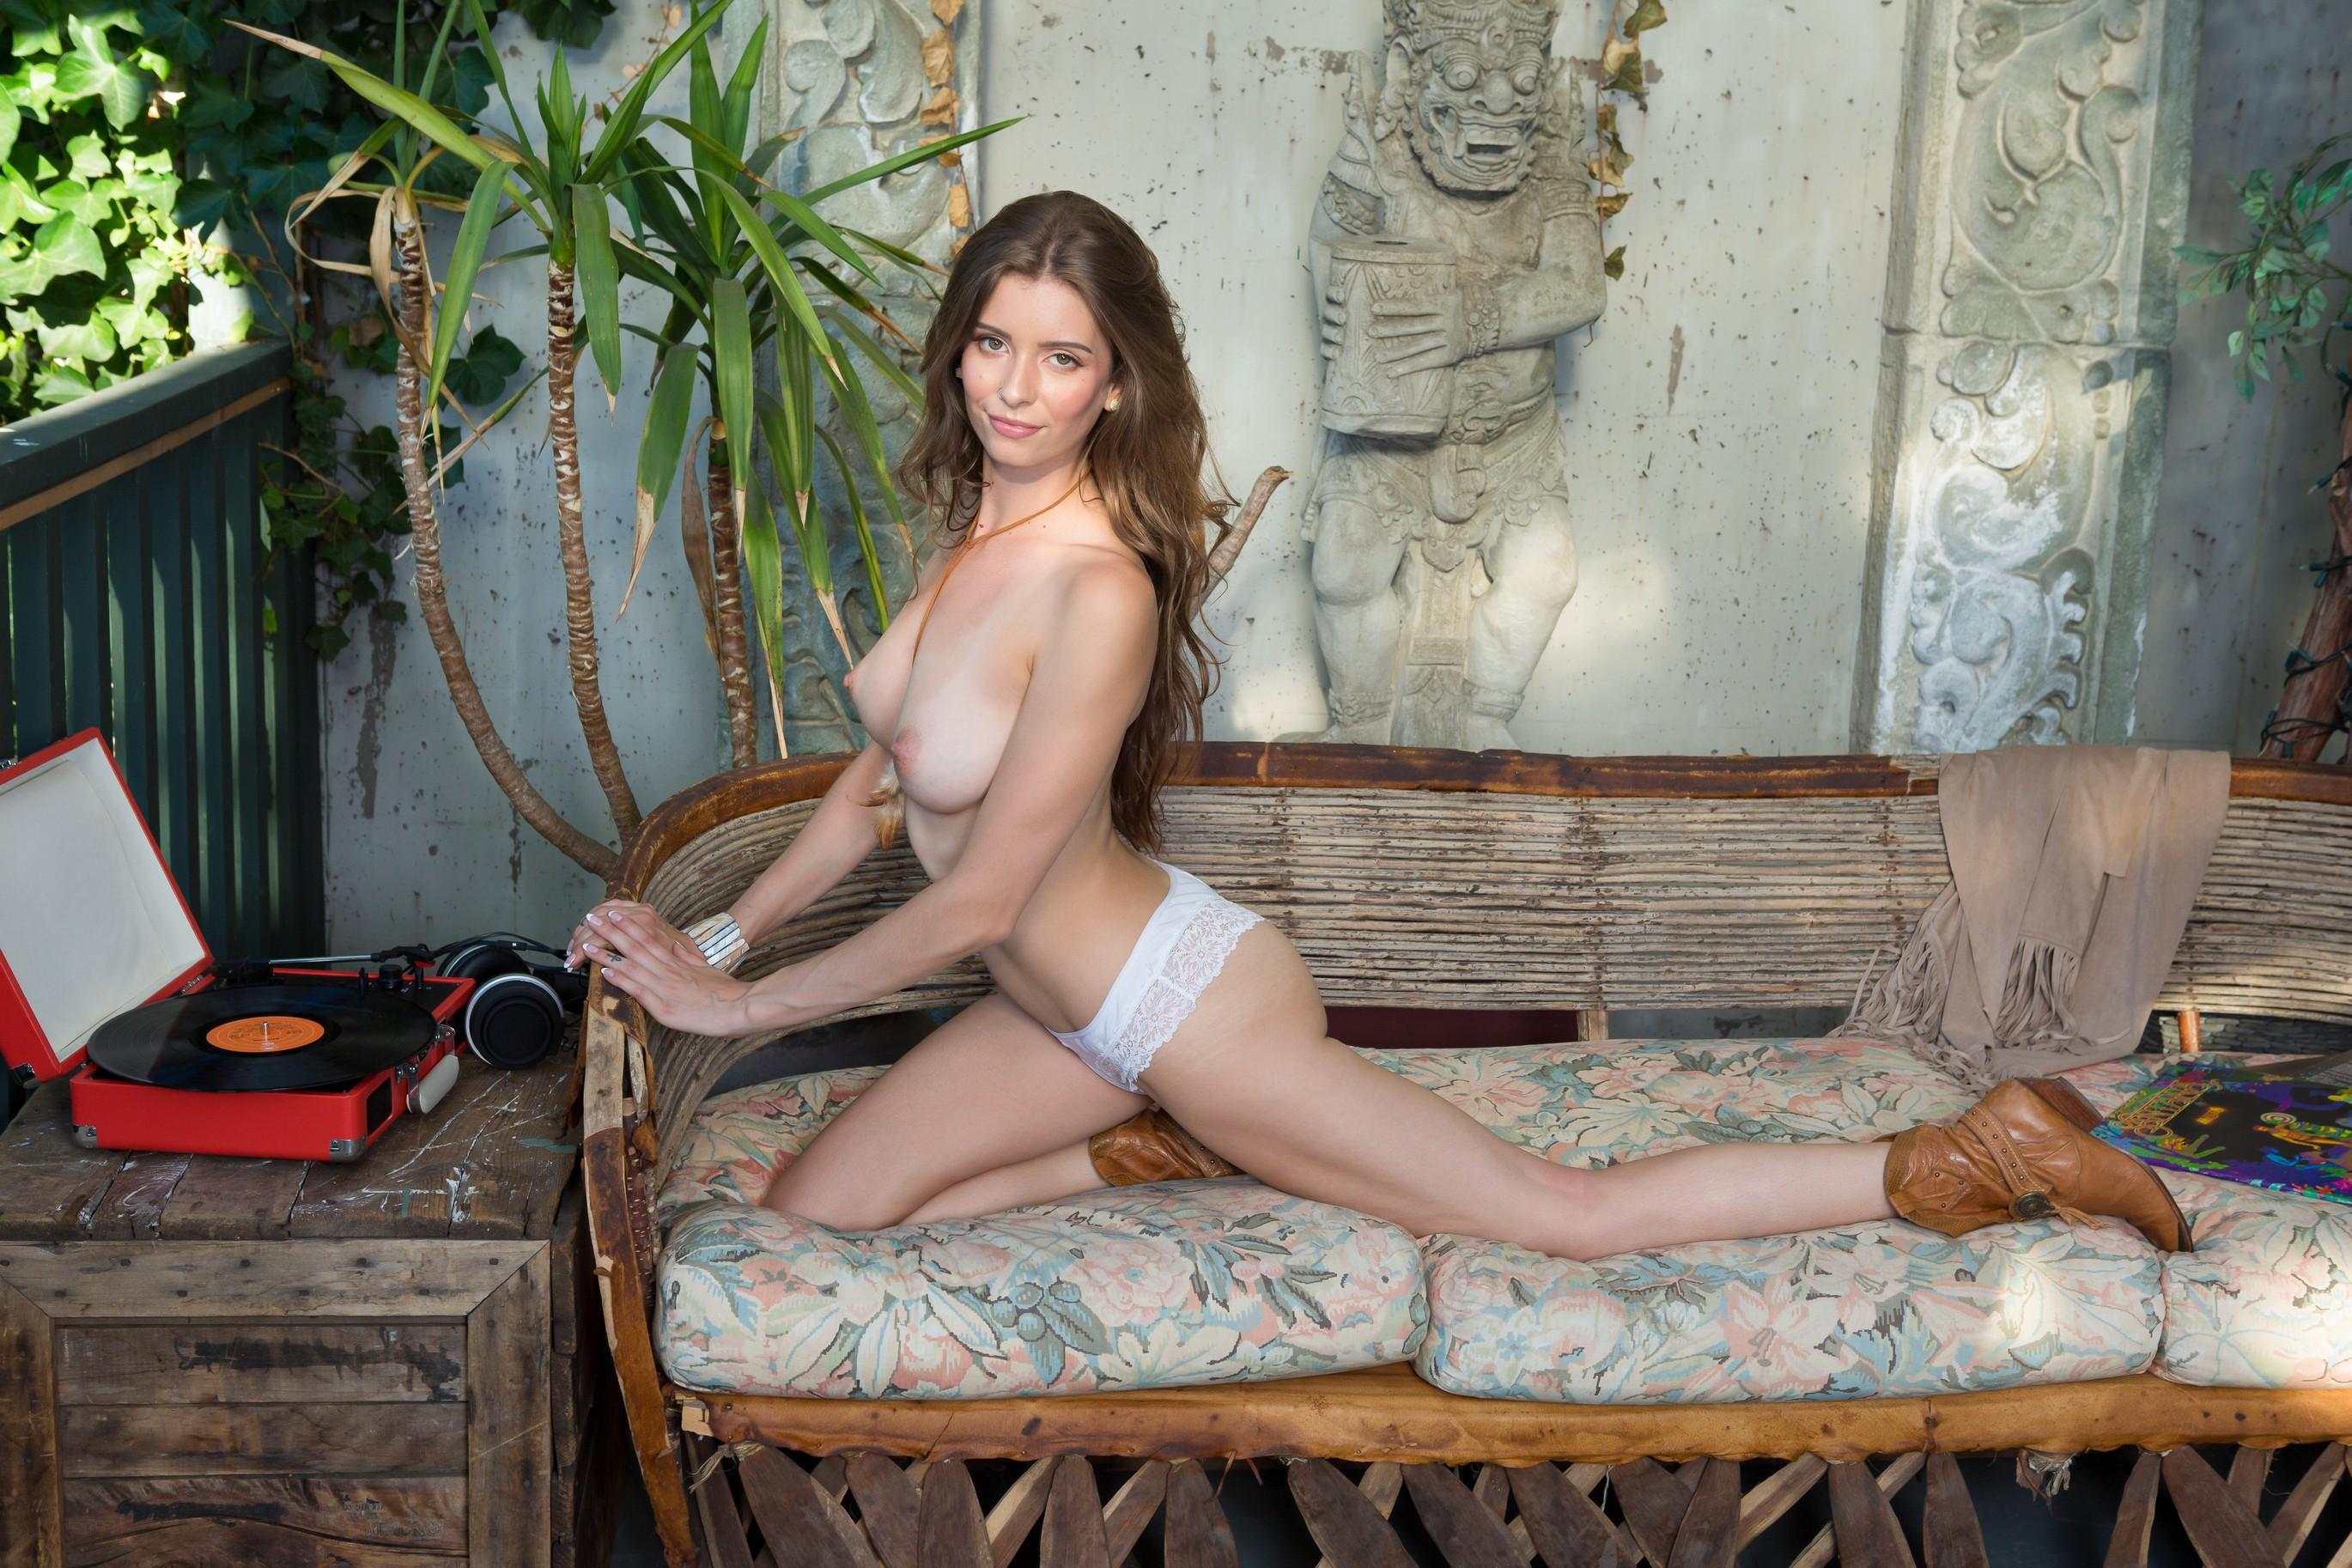 Playboyplus lauren lee love babe bizarre ultra free pornpics sexphotos xxximages hq gallery